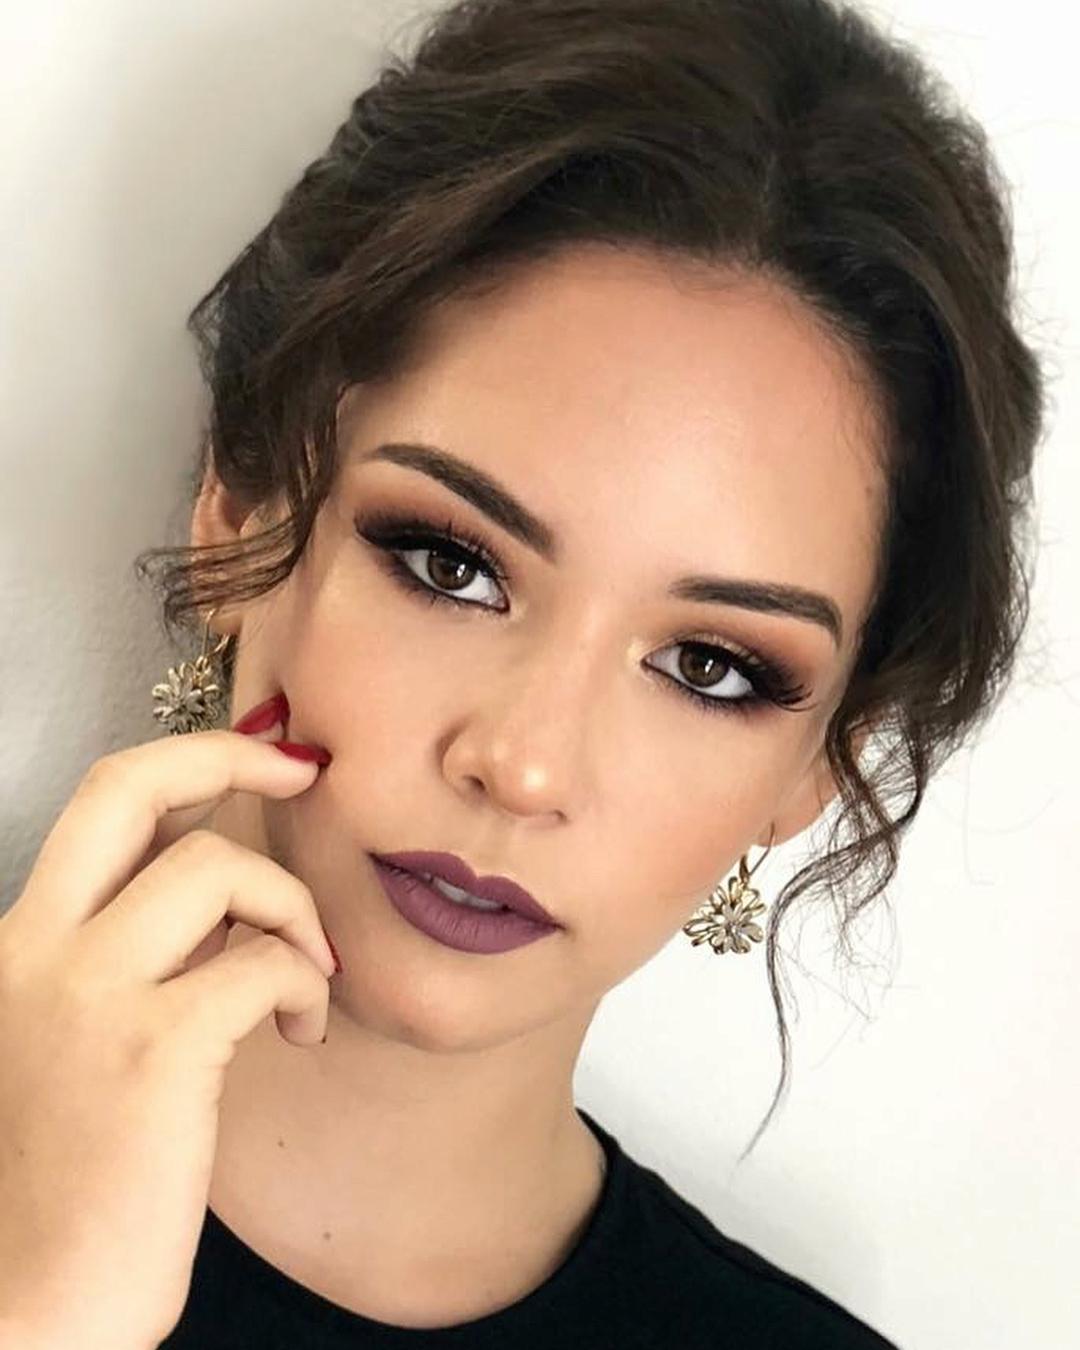 alicia montoya, miss teen model internacional 2018. - Página 2 31705110